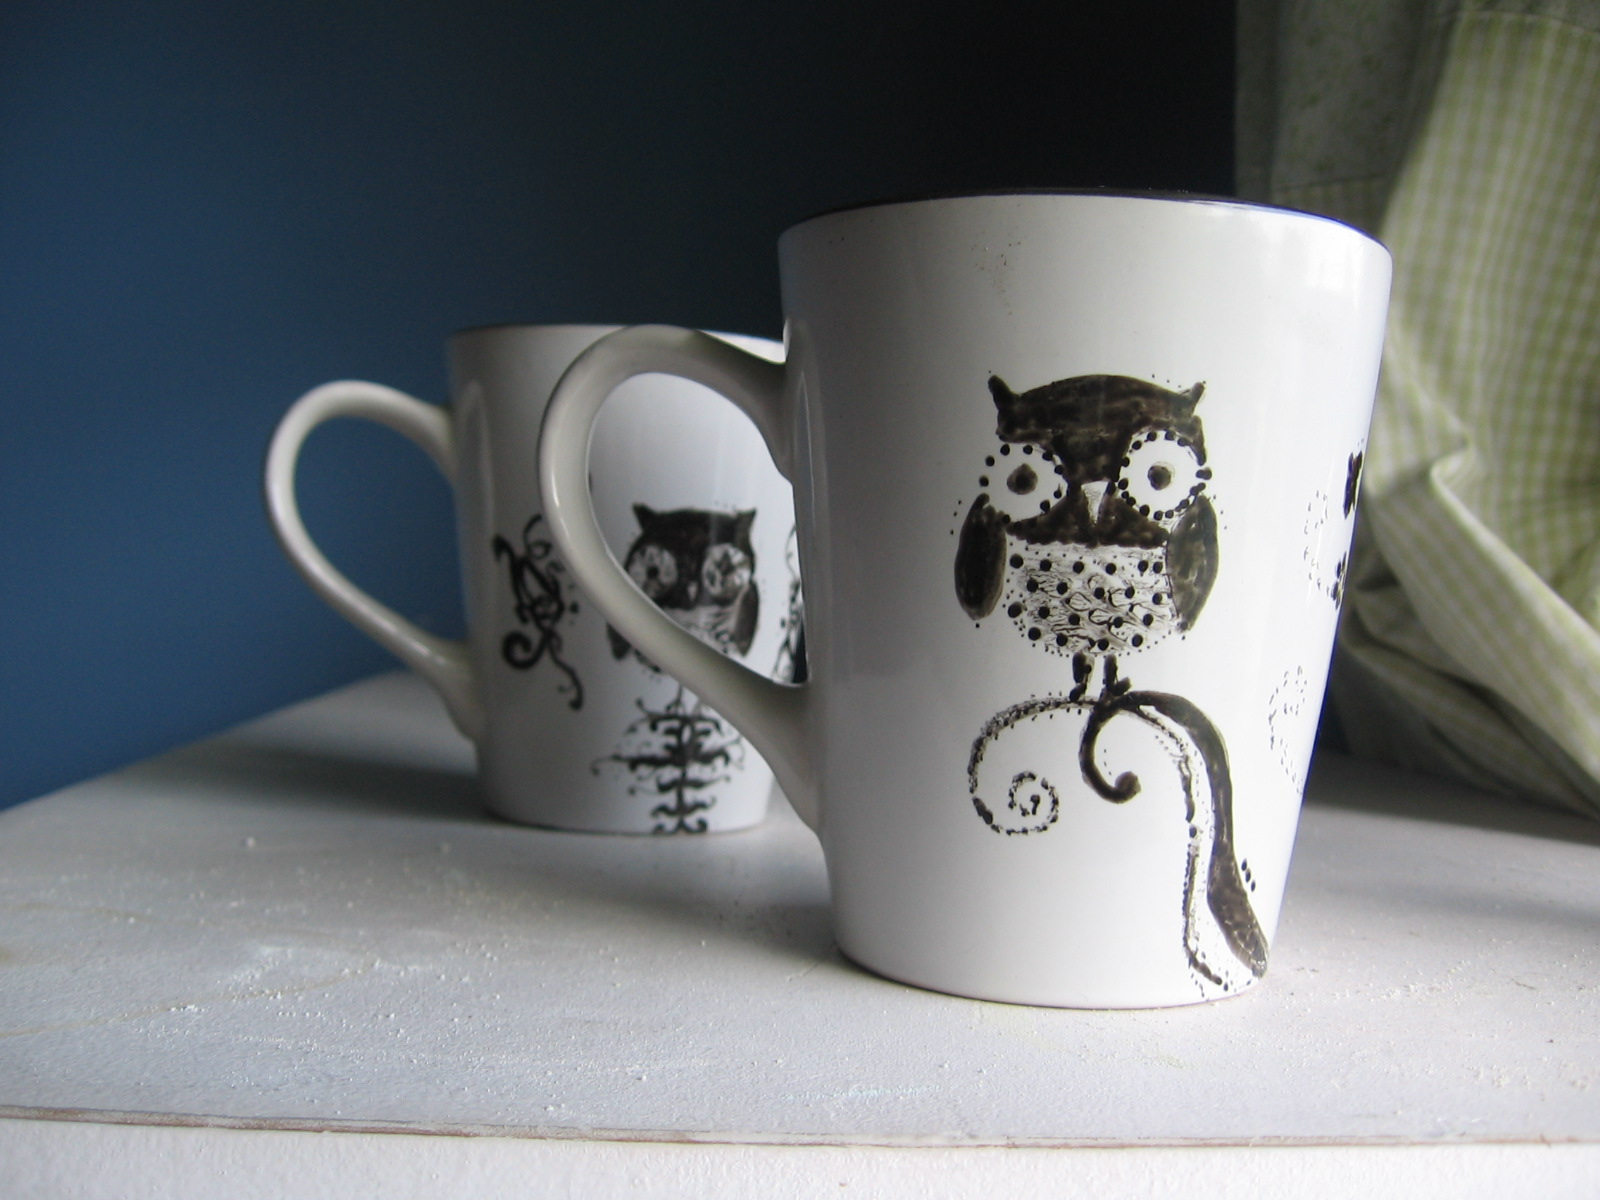 best coffee mug designs rachel u0027s musings tutorial good for beginners decorate your own mug - Cup Design Ideas